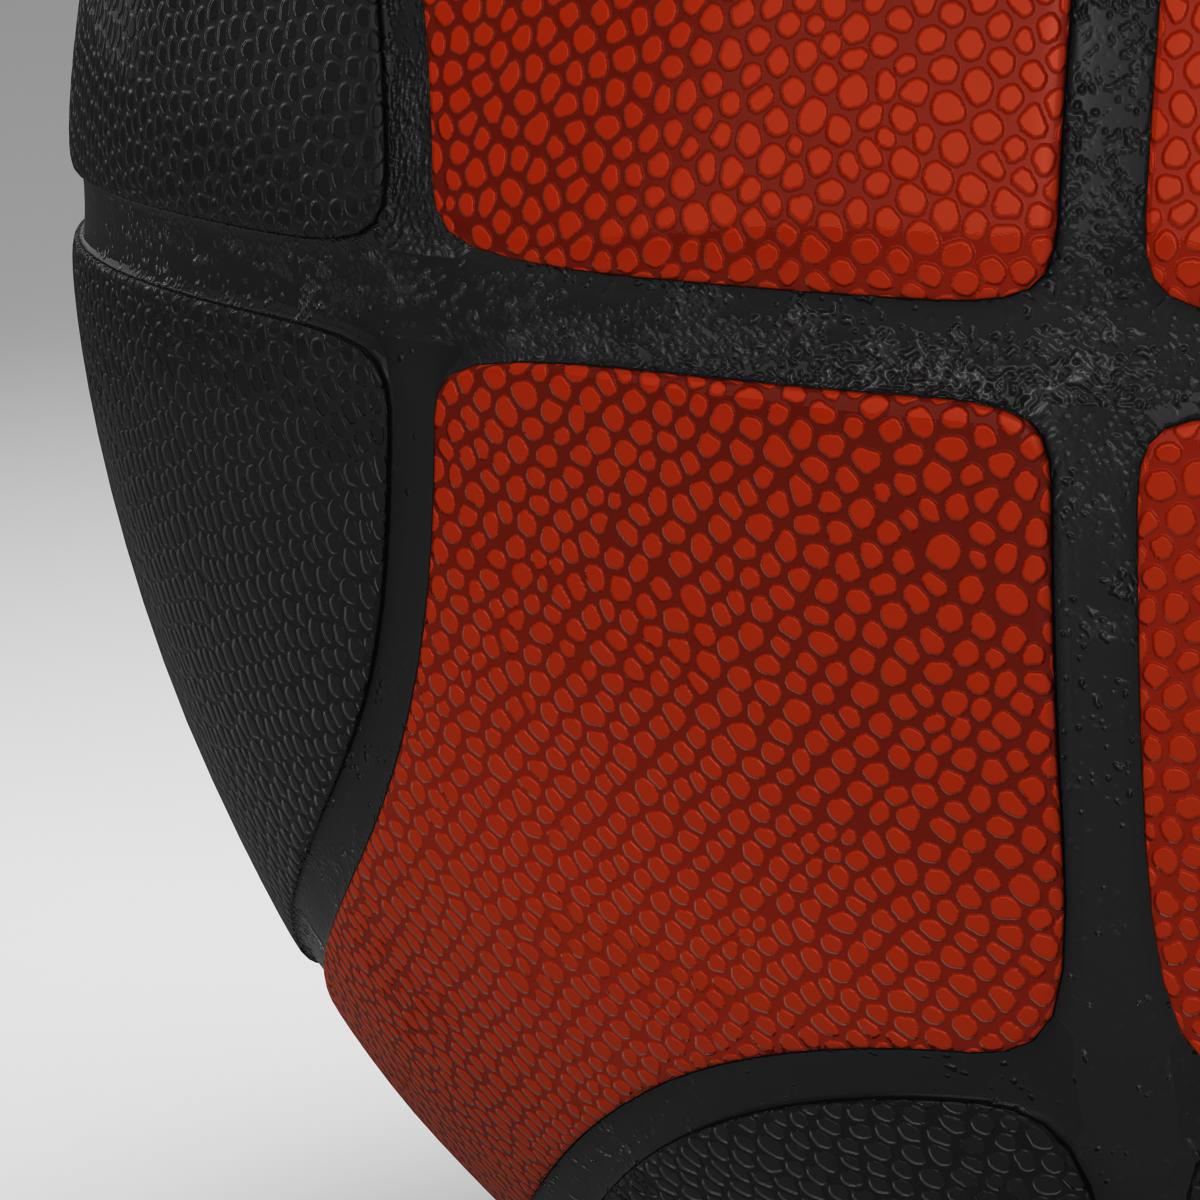 basketbola bumba eba melna 3d modelis 3ds max fbx c4d ma mb obj 165307